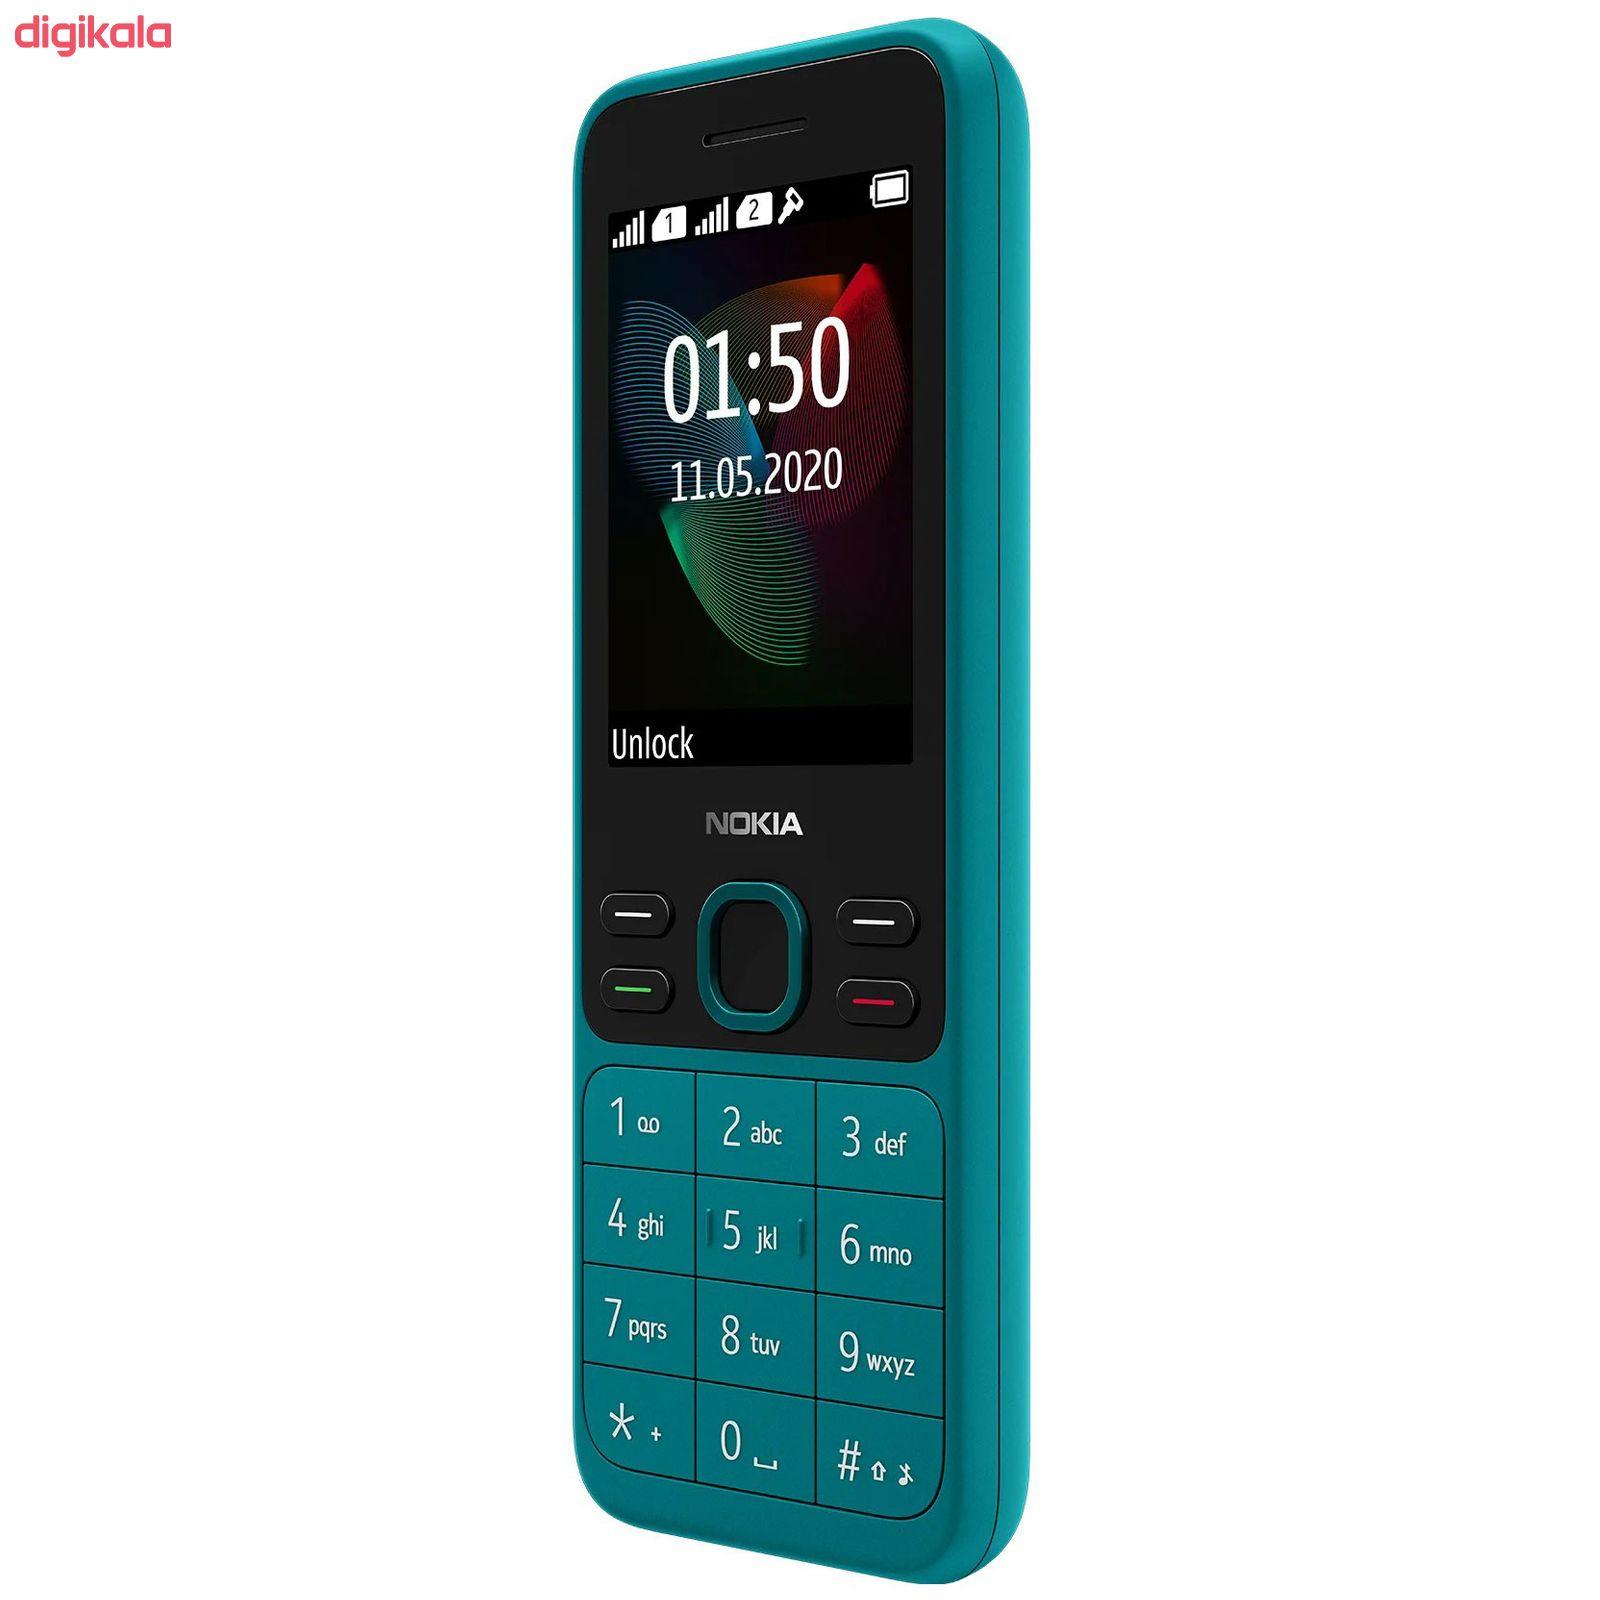 گوشی موبایل نوکیا مدل 150 - 2020 TA 1235 DS دو سیم کارت main 1 3